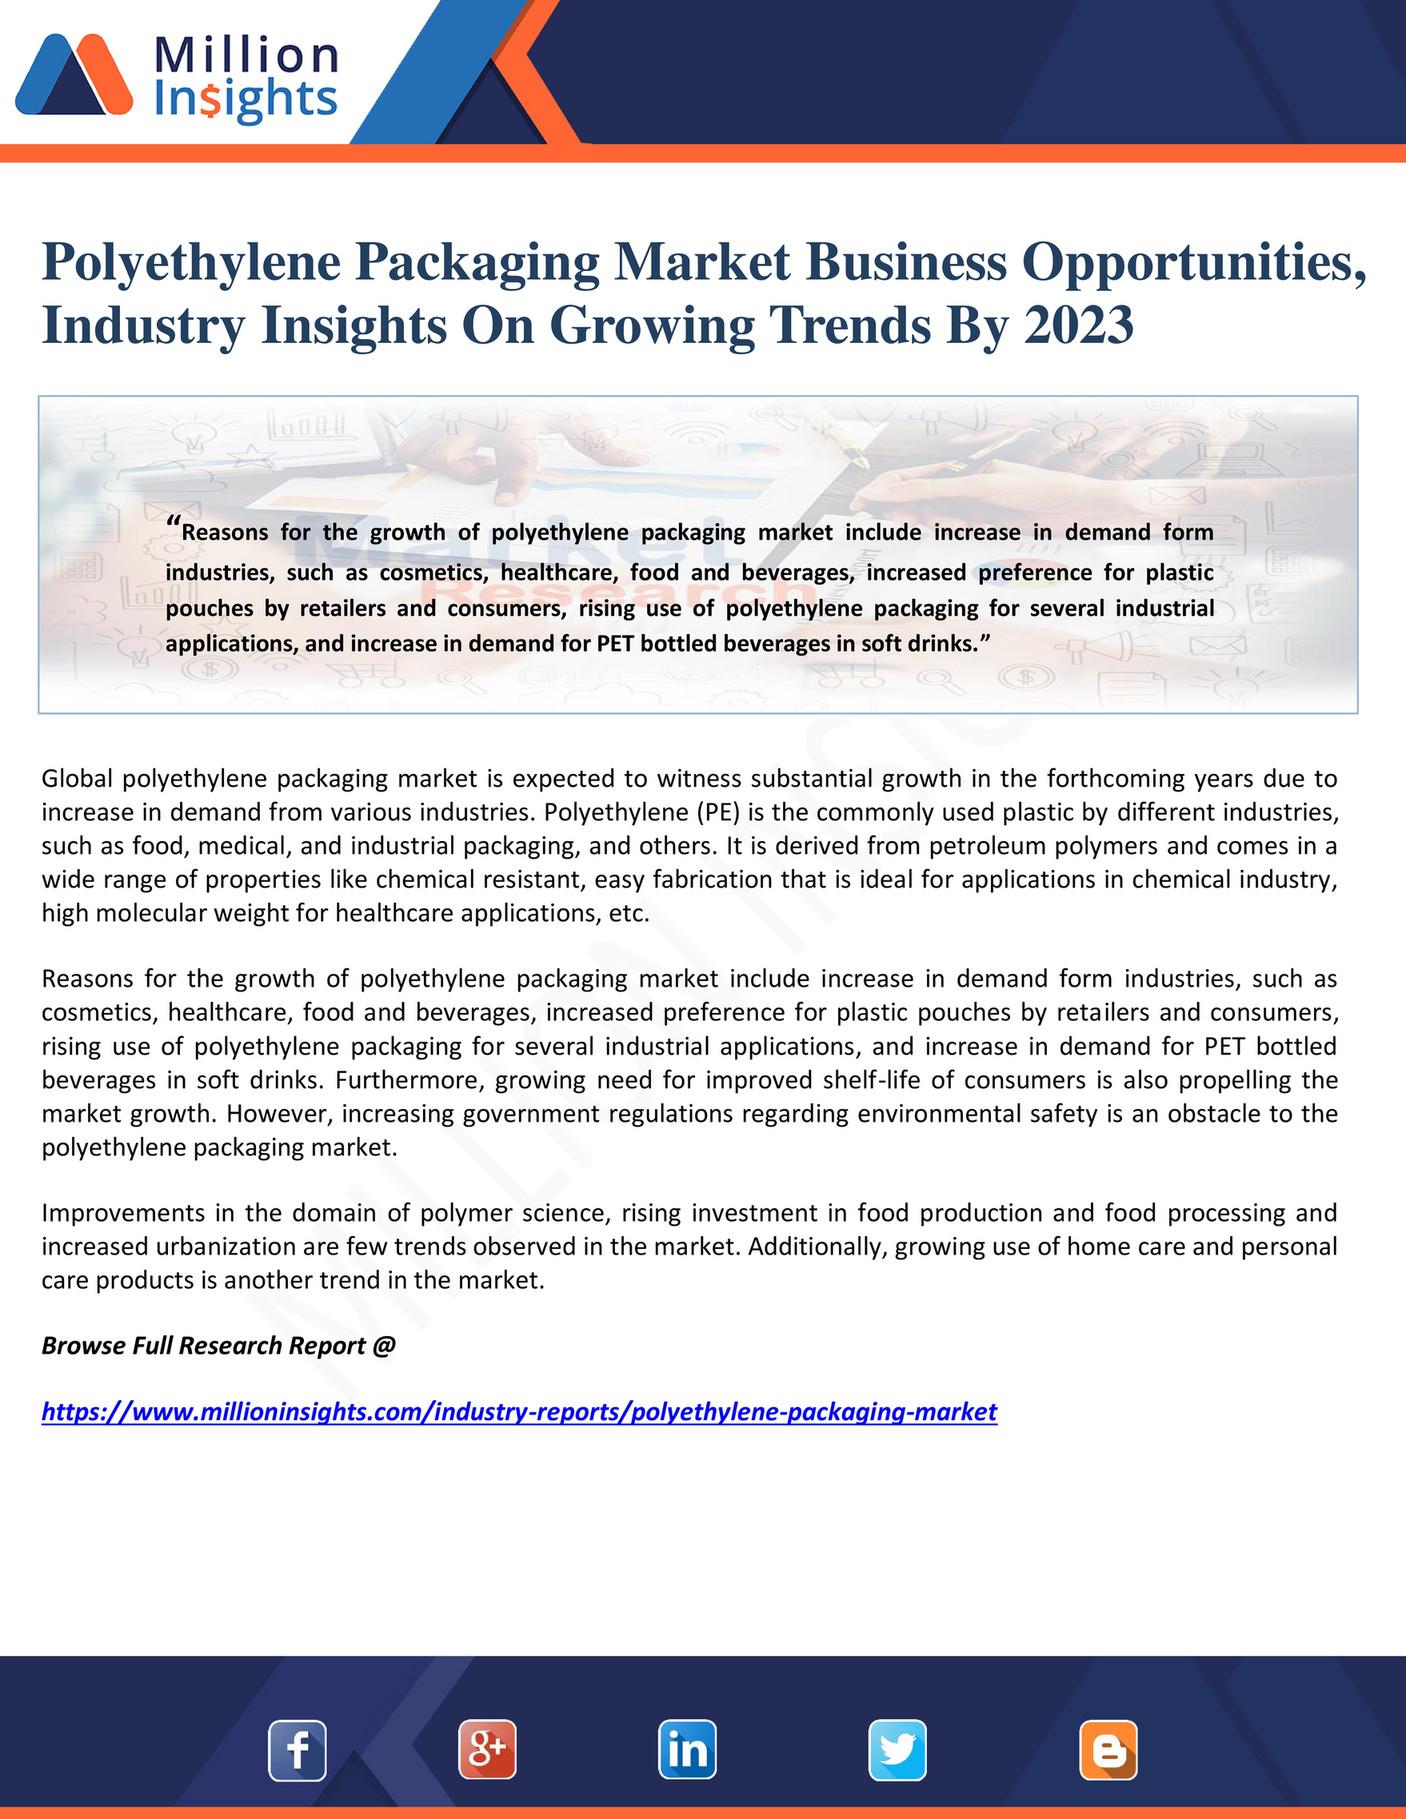 Million Insights - Polyethylene Packaging Market Business